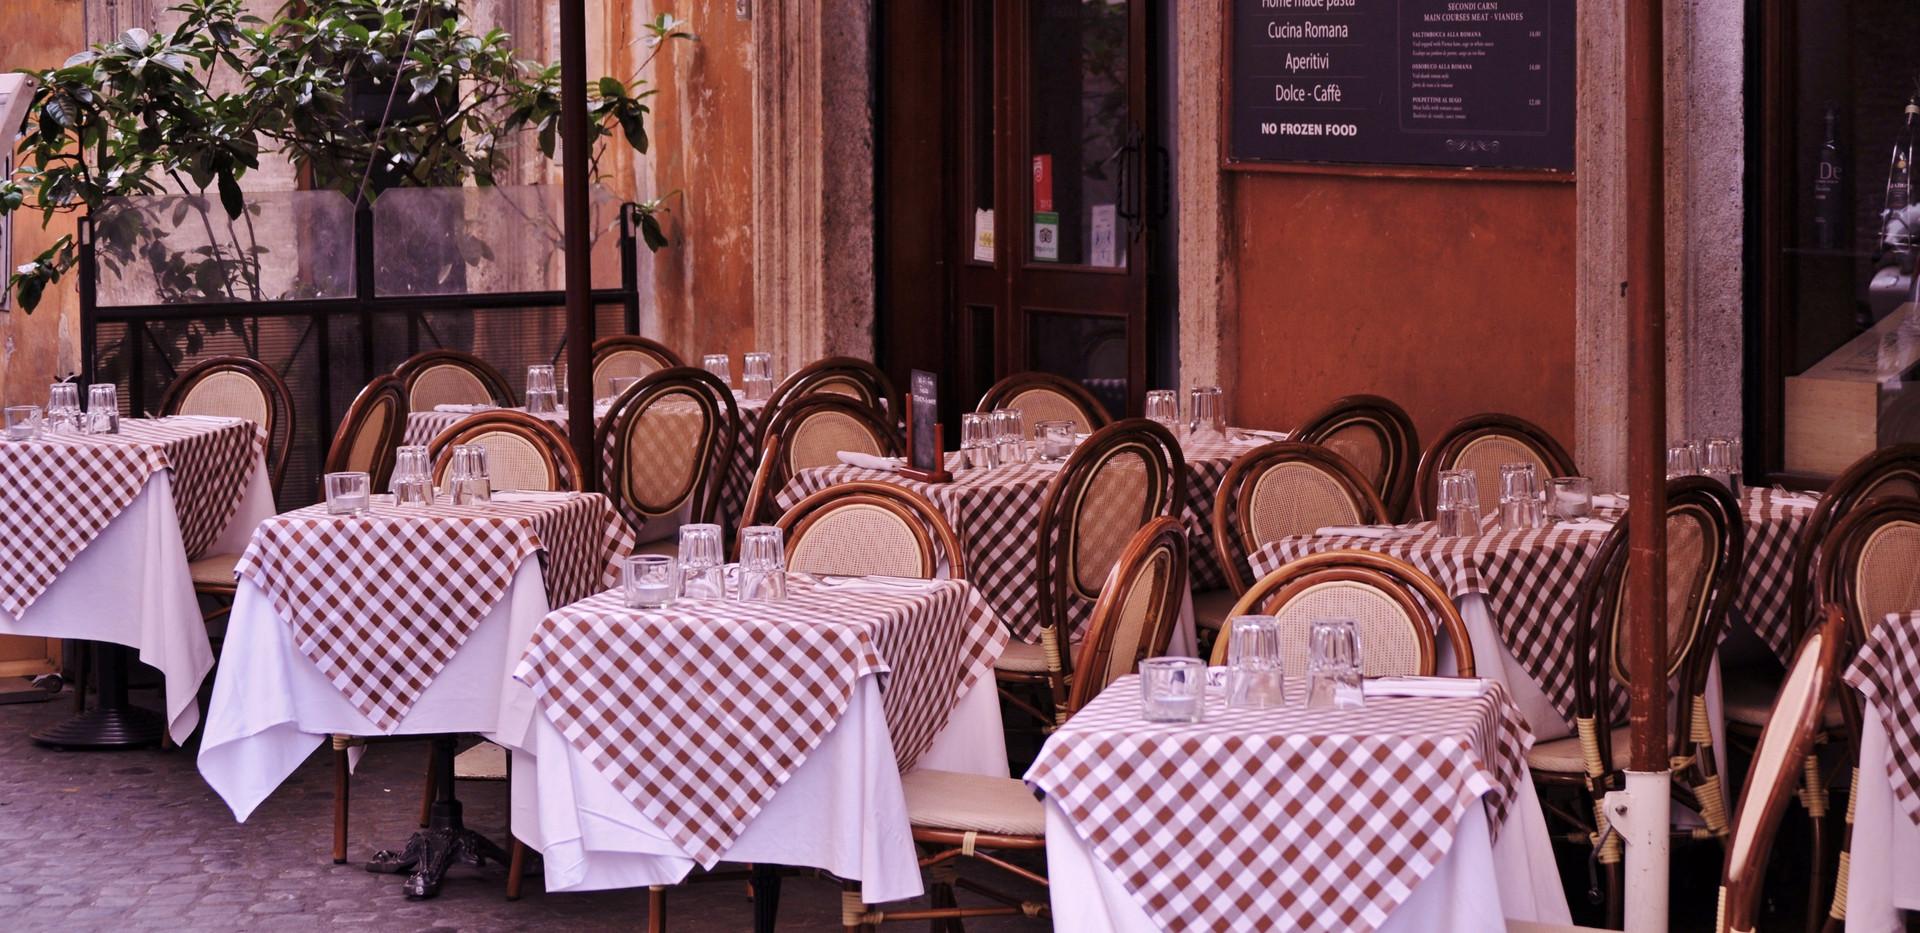 italian-italy-pasta-3498.jpg